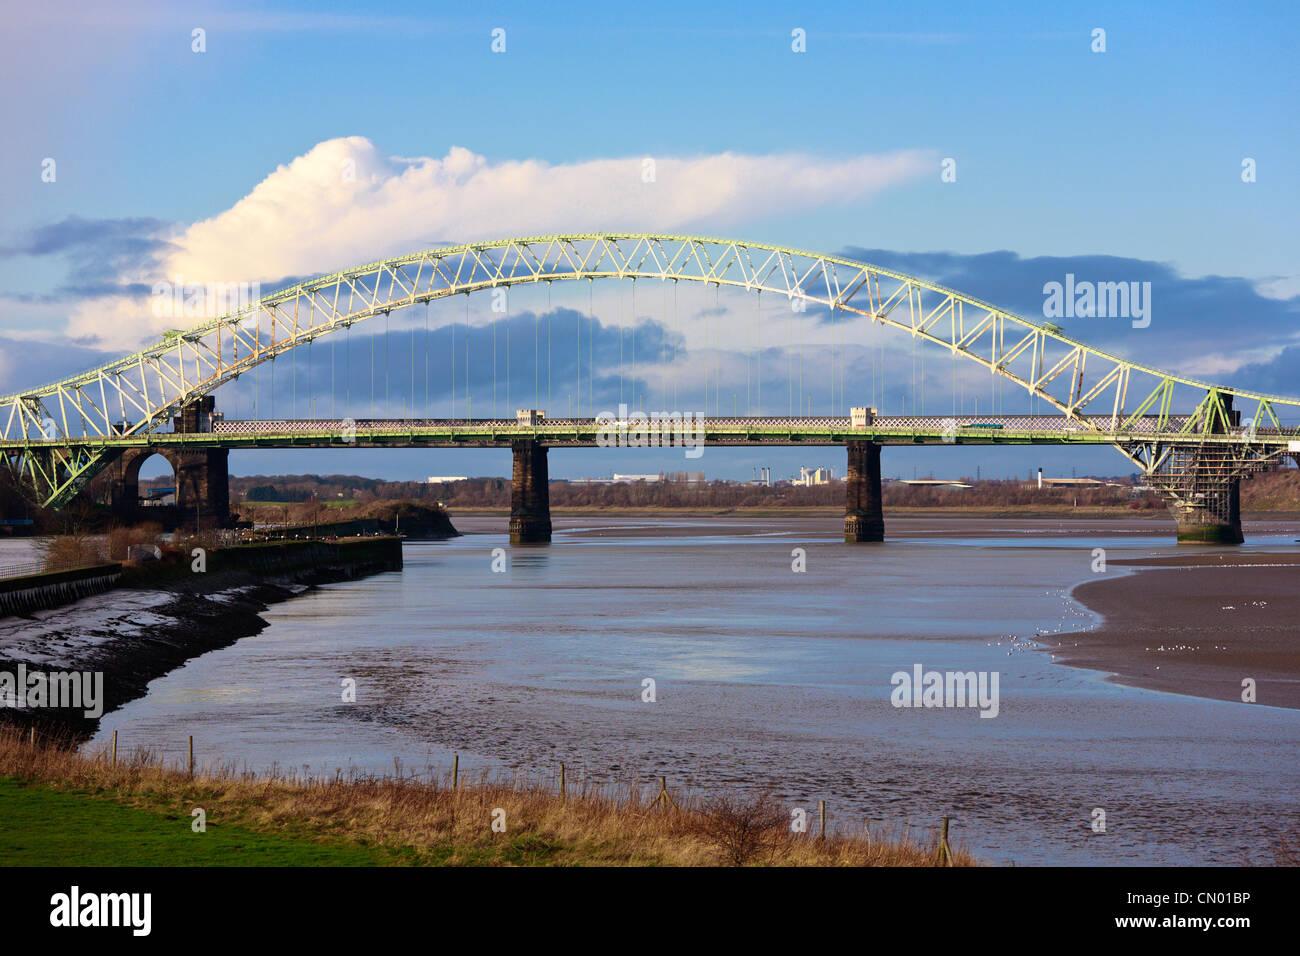 Runcorn Bridge, England - Stock Image